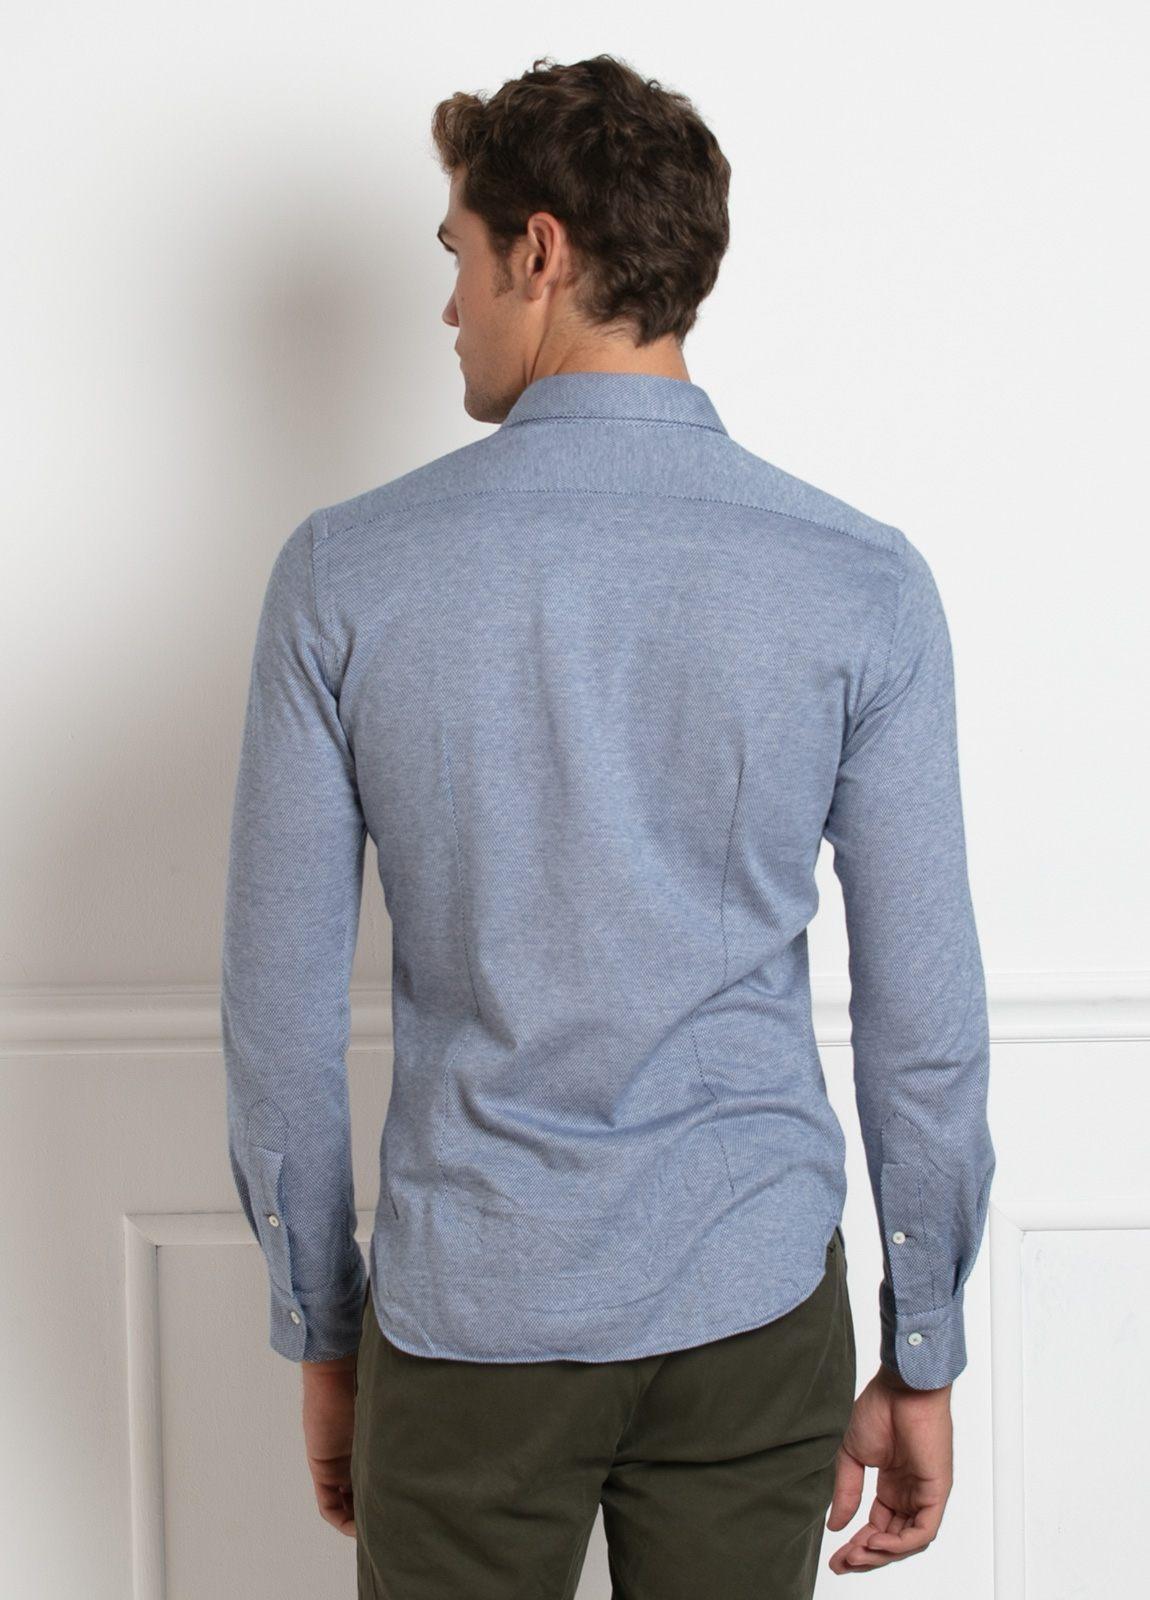 Camisa sport SLIM FIT modelo LEO textura color azul. 100% Algodón. - Ítem1